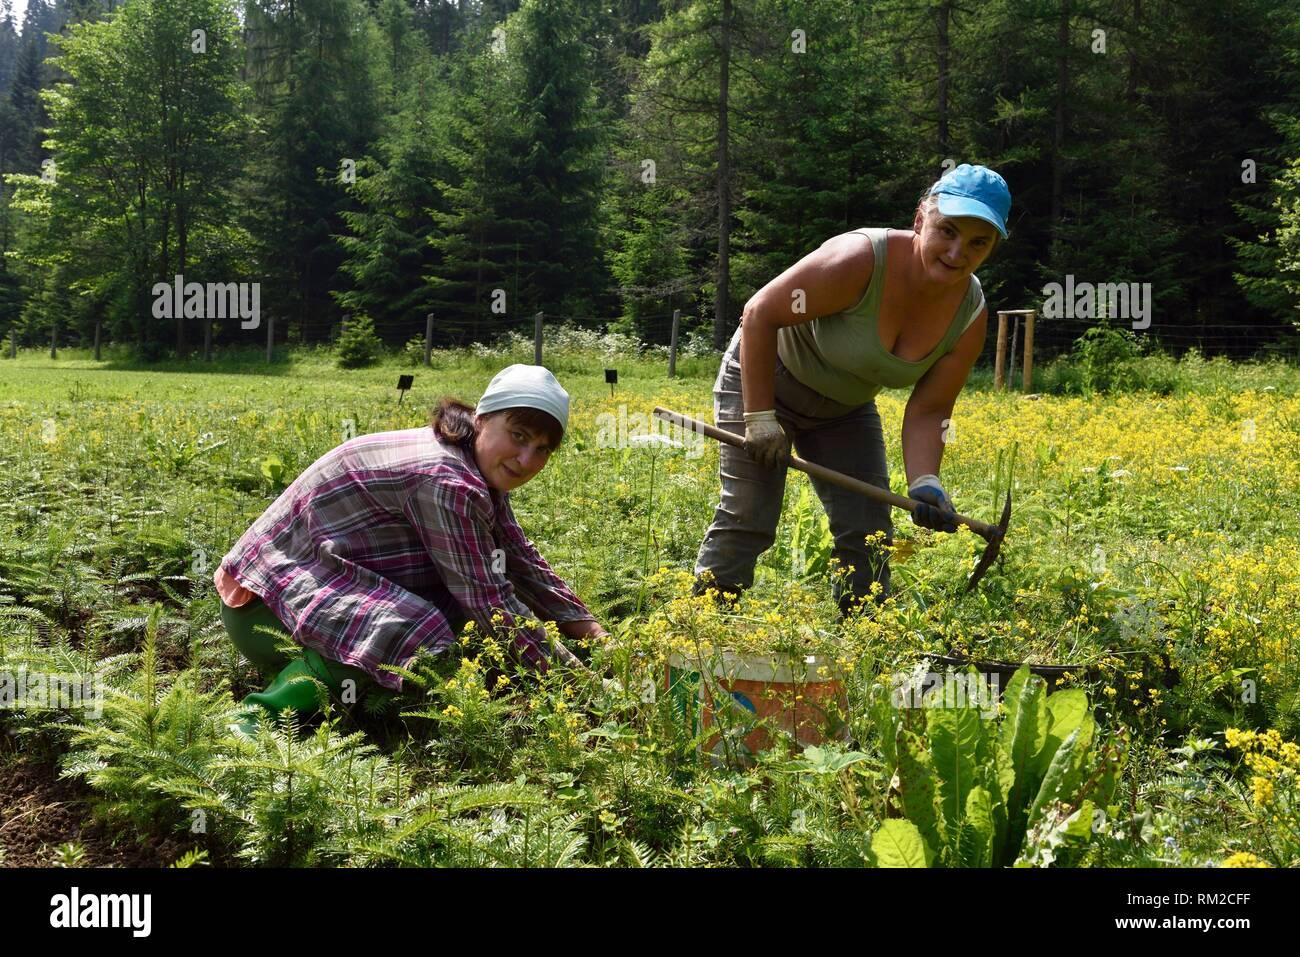 women working in a nursery coniferus trees for forestation, Chocholowska Valley, near Witow, Podhale Region, Polish Tatra mountains, Malopolska Stock Photo